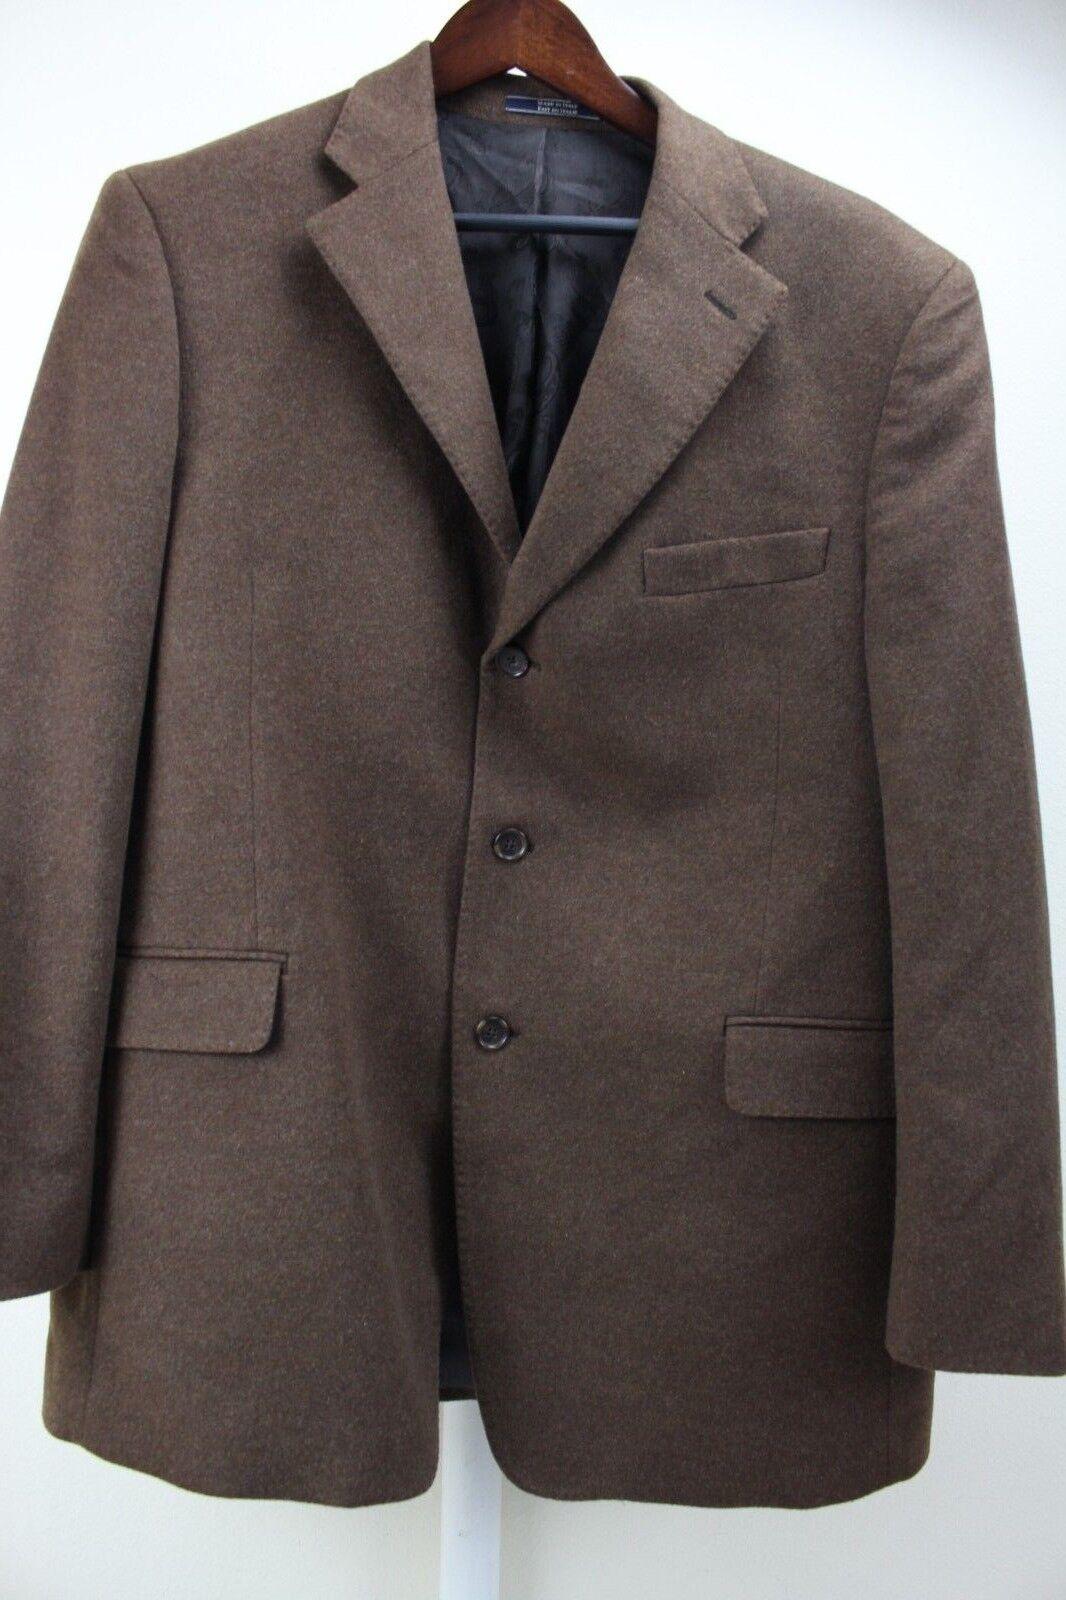 Arnold Brant Colombo Cashmere & Mink Blend Braun 3 Button Lined Blazer Größe 44R